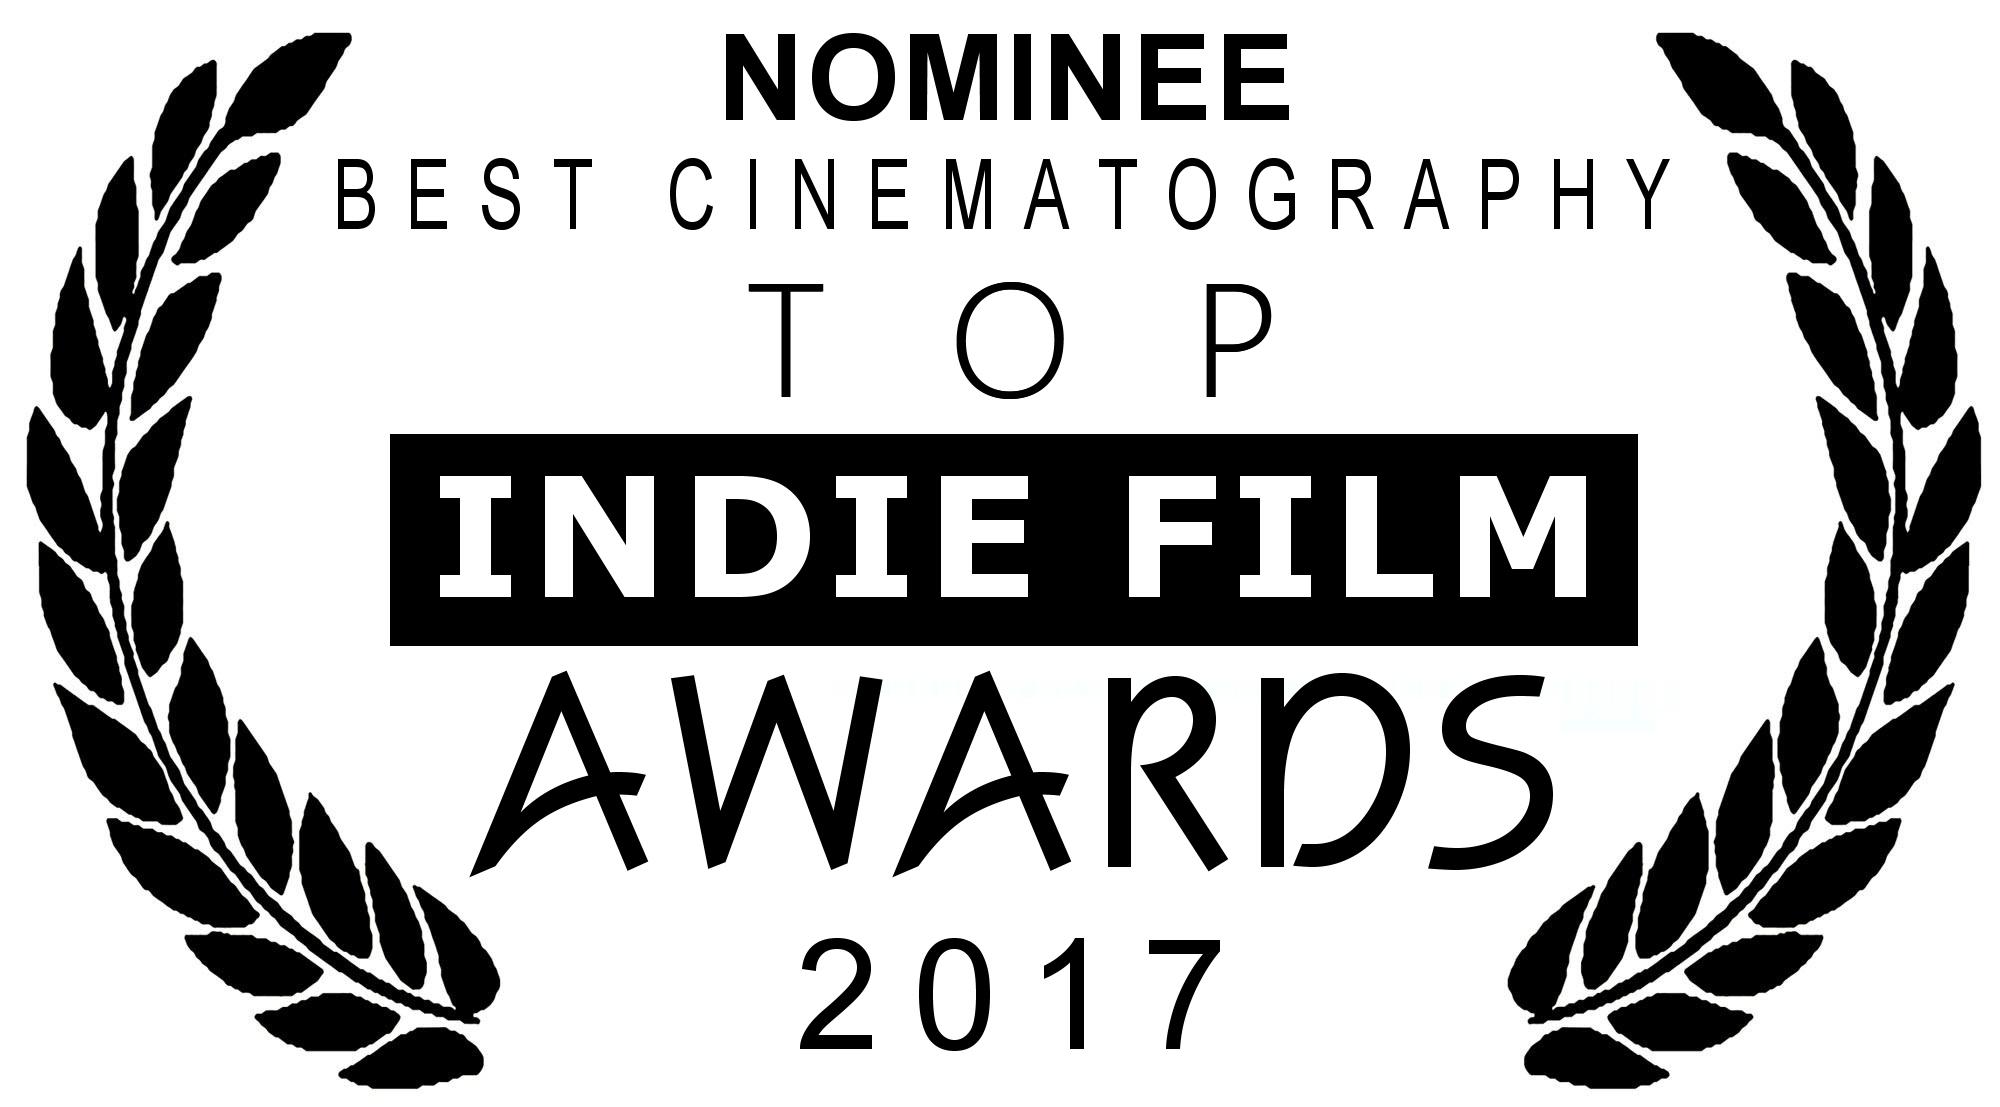 tifa-2017-nominee-best-cinematography.jpg